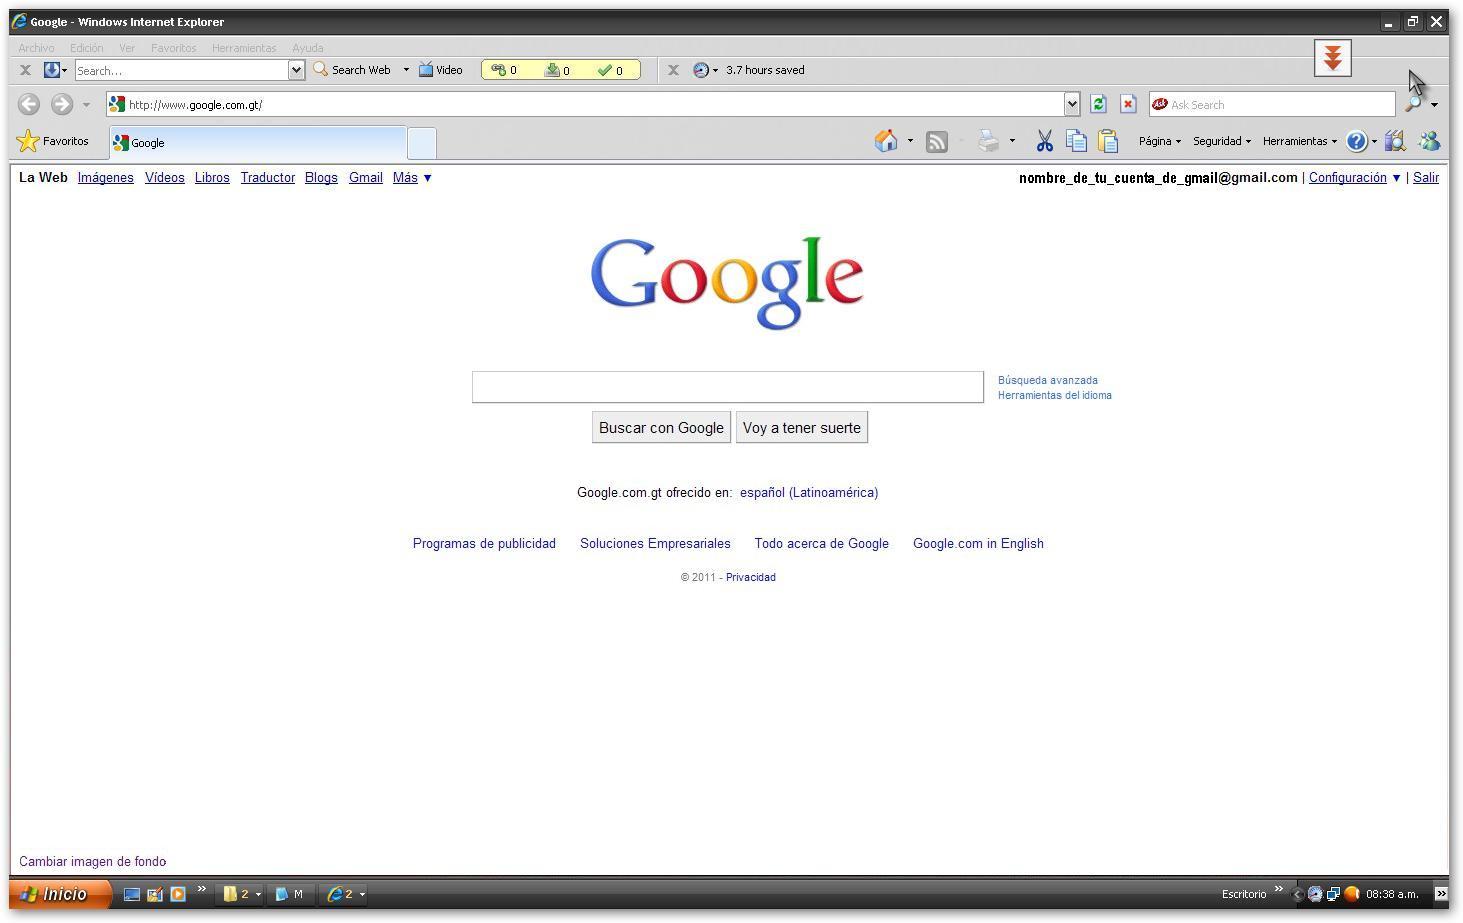 Google En Espanol